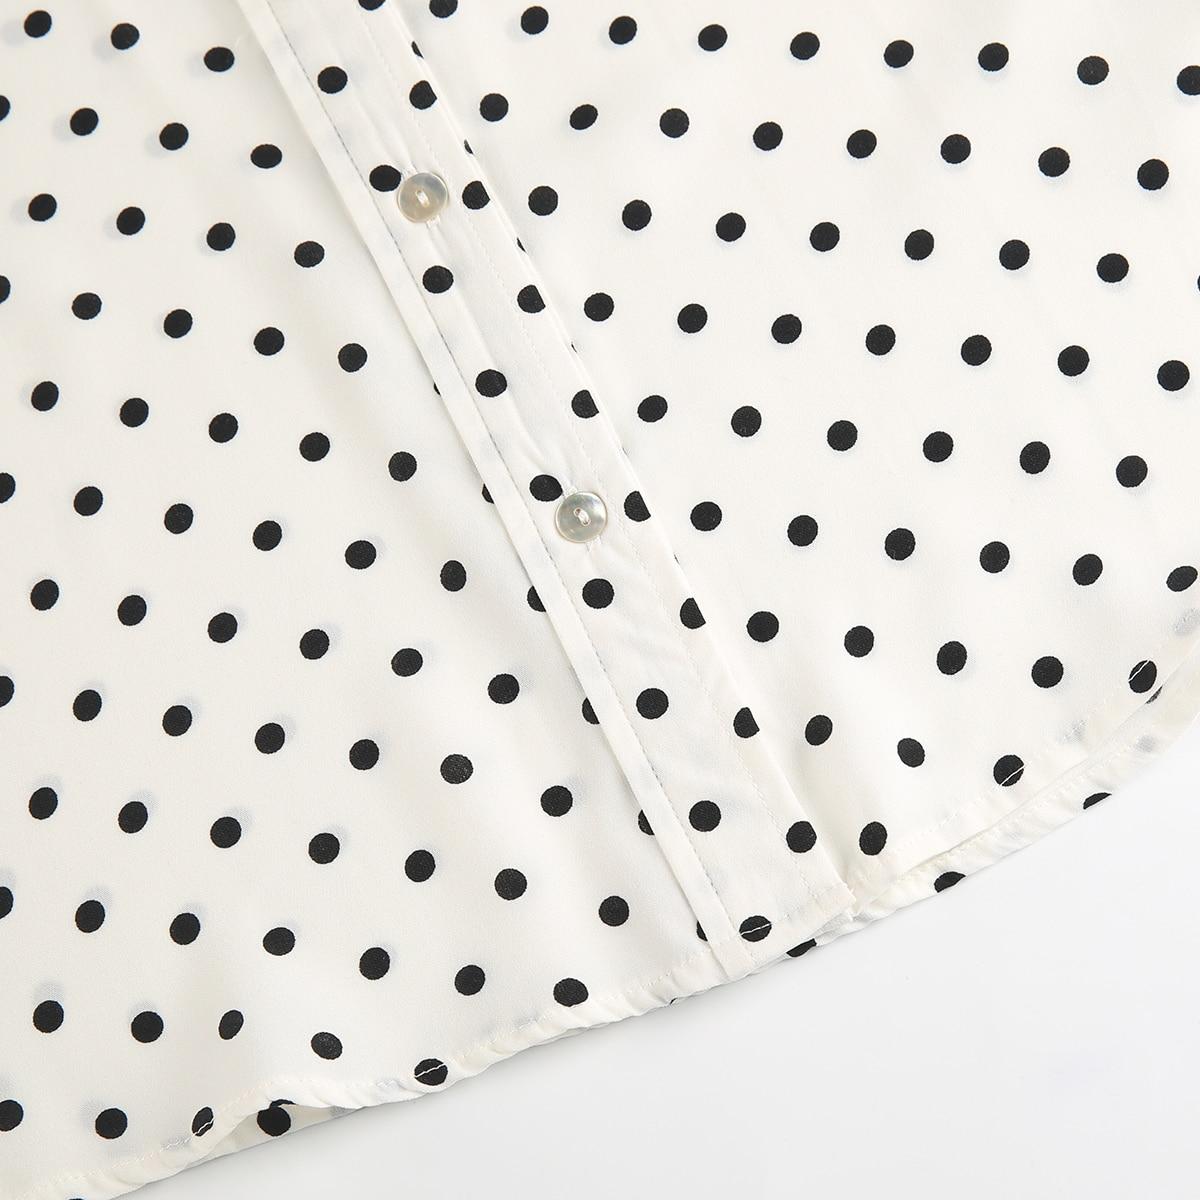 MCO New Basic Polka Dot Print Plus Size Women Blouse Casual Oversized Top Big Women Clothing Simple Spot Loose Shirt 5xl 6xl 7xl 5